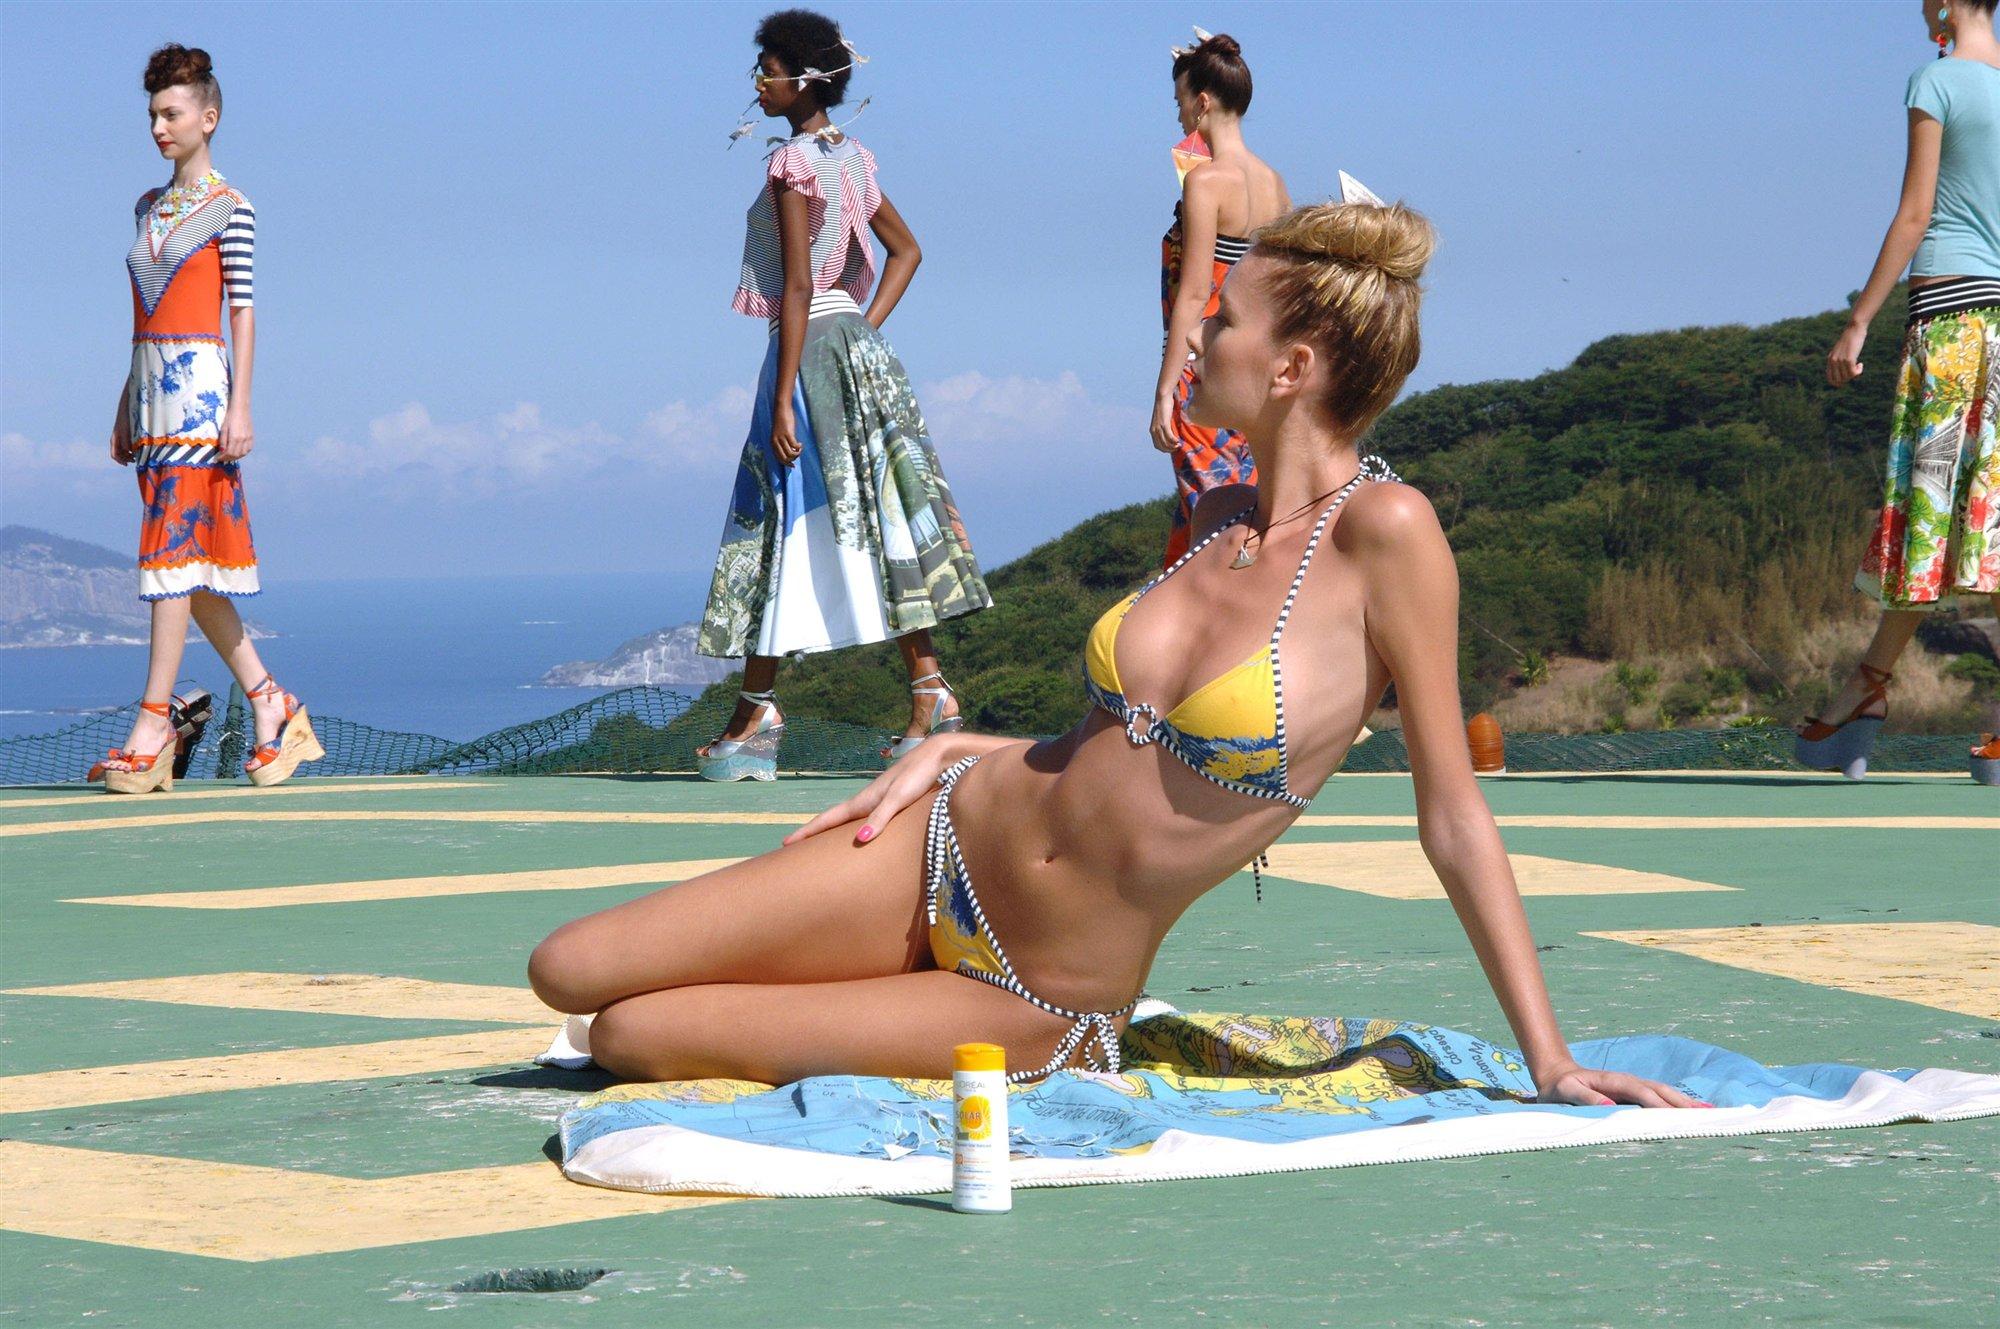 Gianne Albertoni